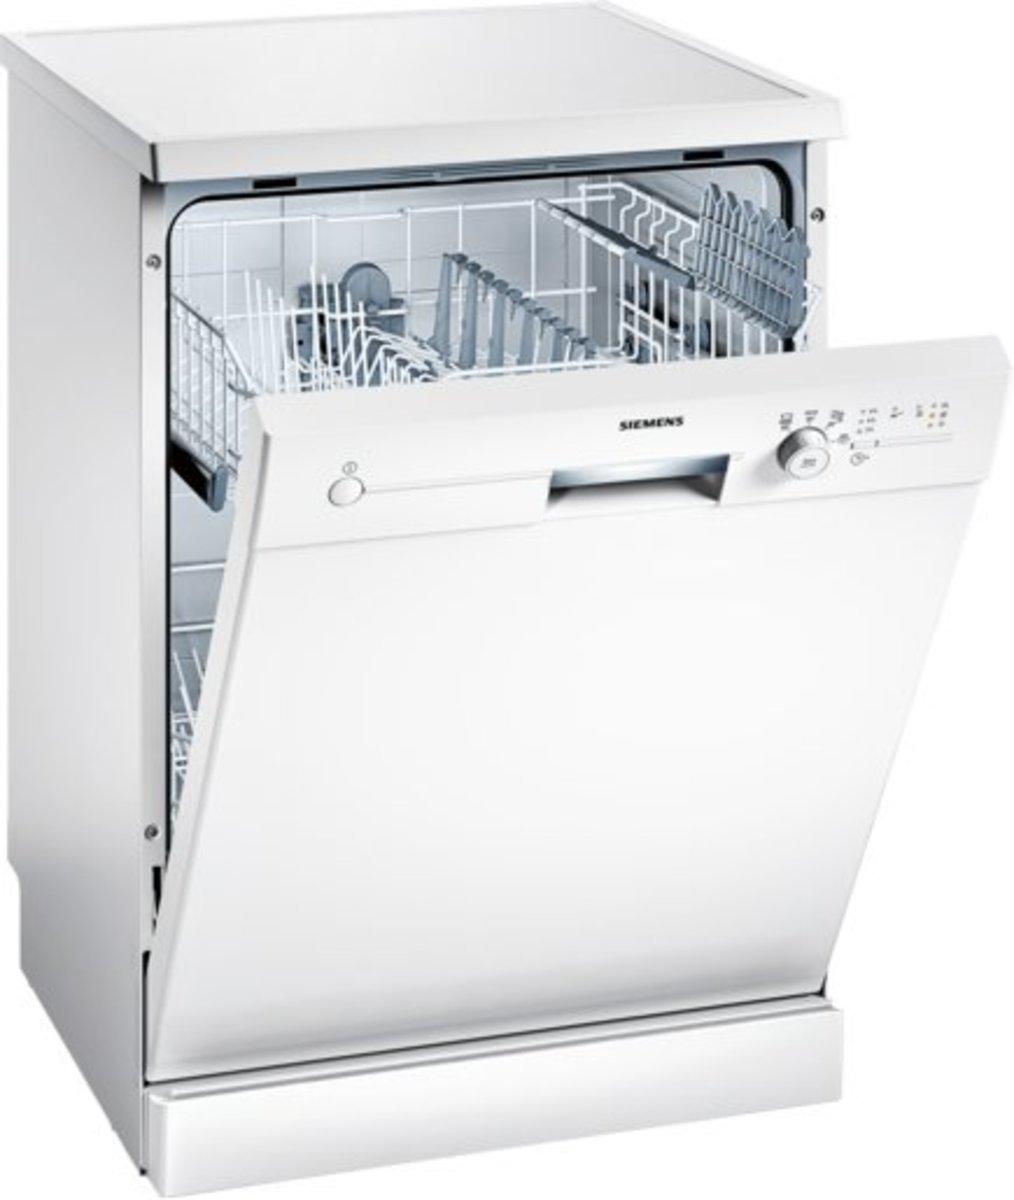 iQ100 Freestanding dishwasher 60cm SN24D203EU